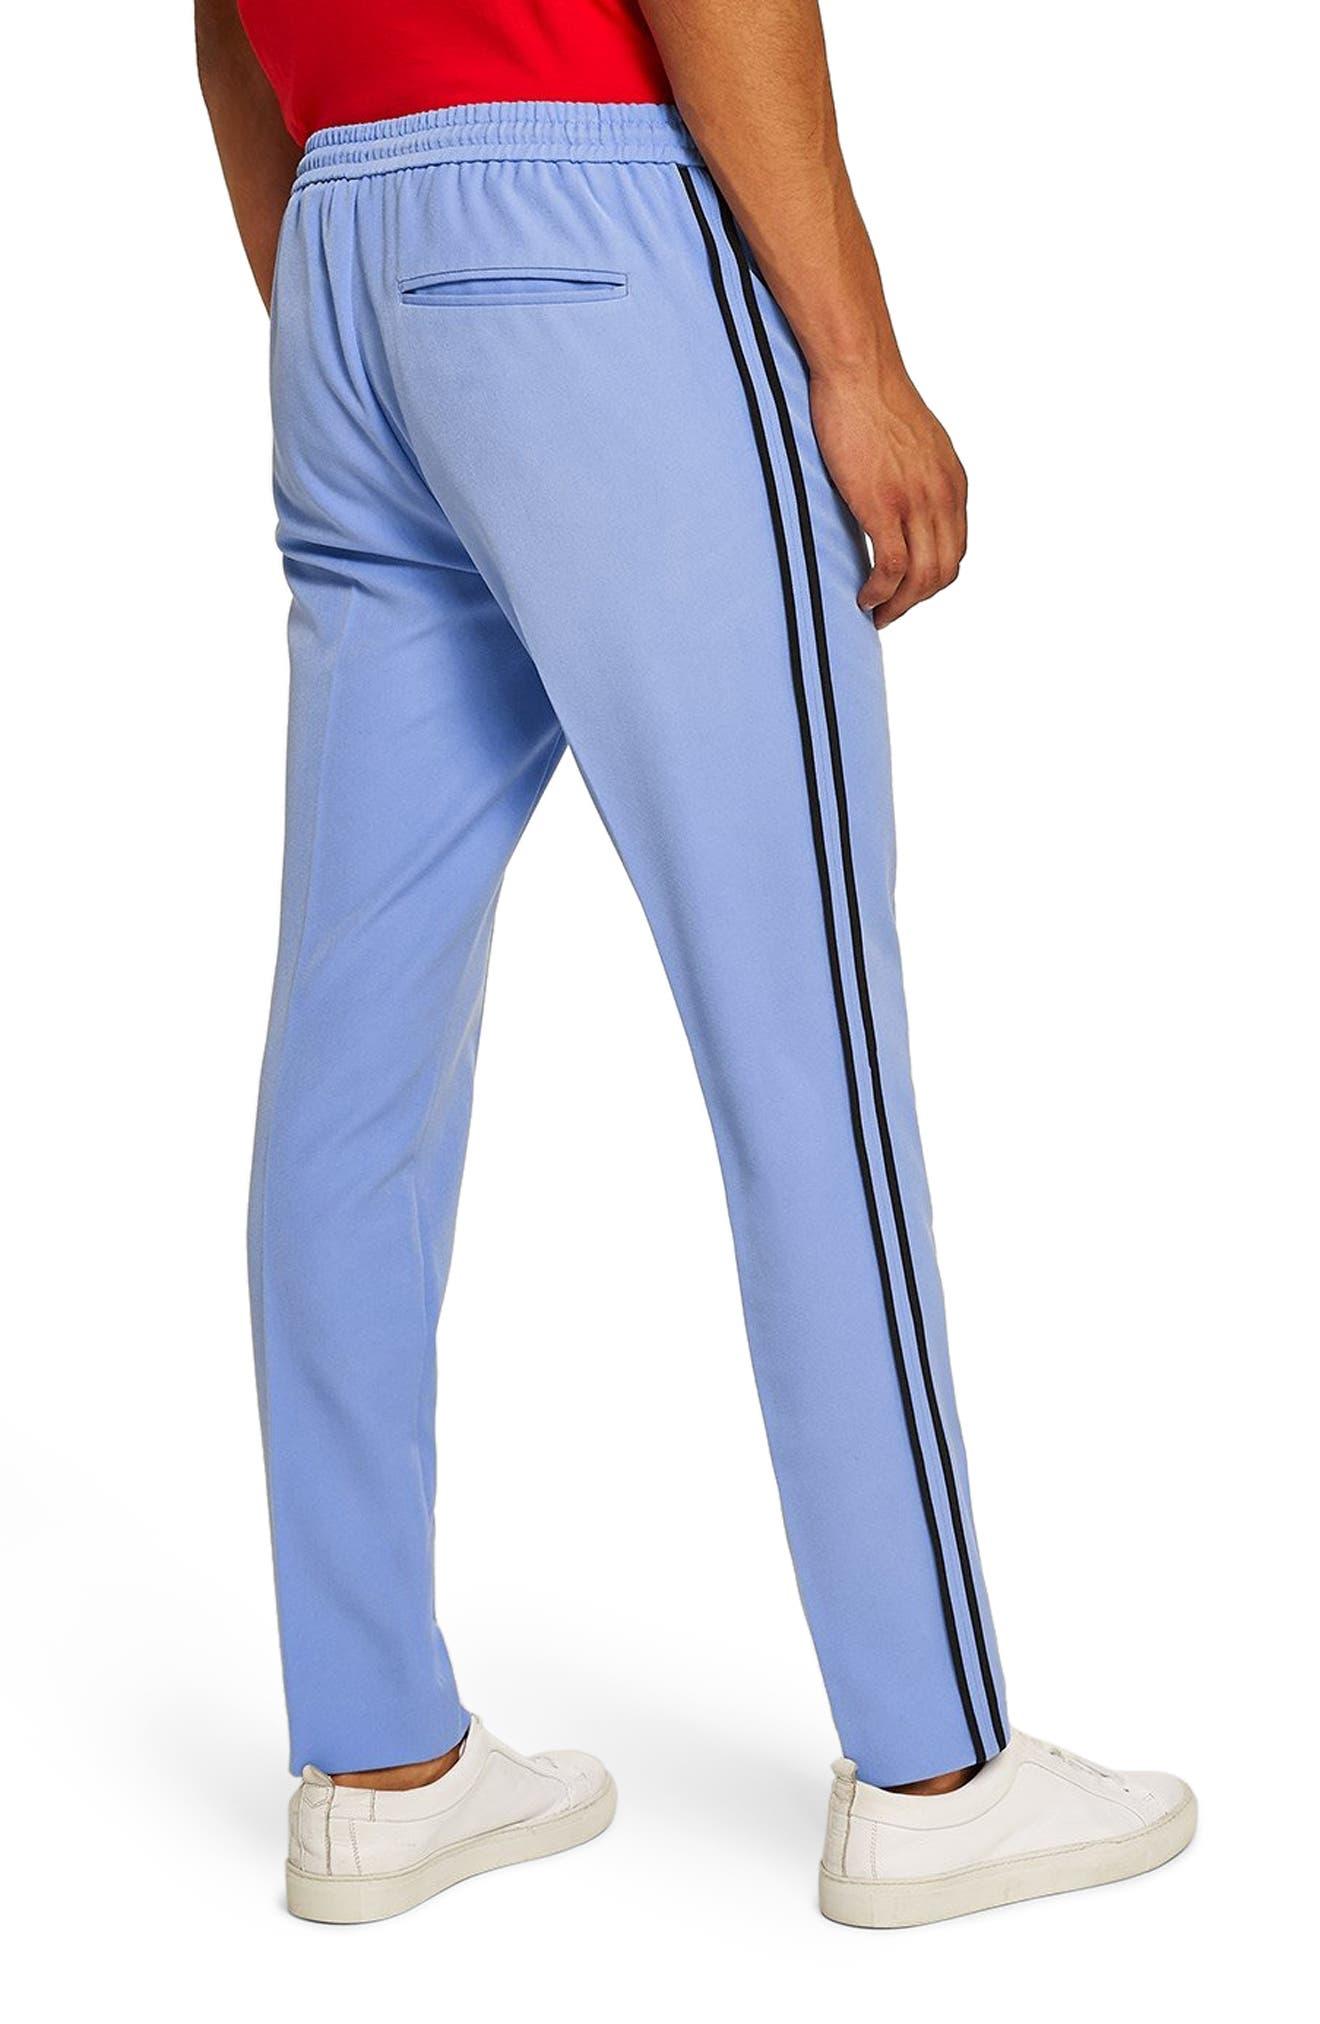 Binding Skinny Fit Jogger Pants,                             Alternate thumbnail 2, color,                             400